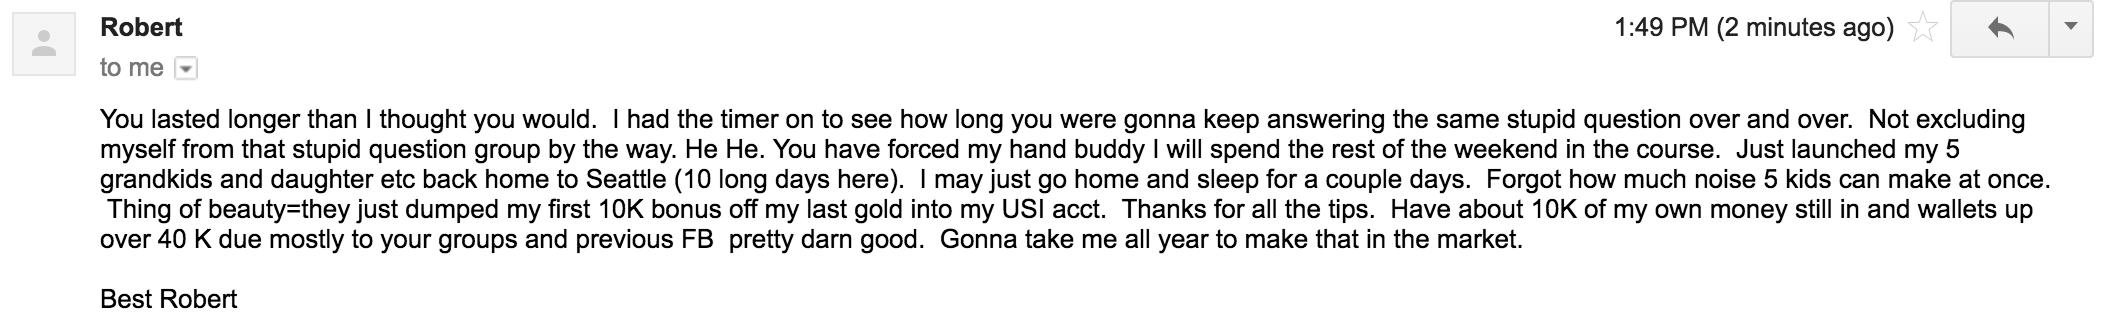 AYFP Kyle Rea crypto testimonials.jpg